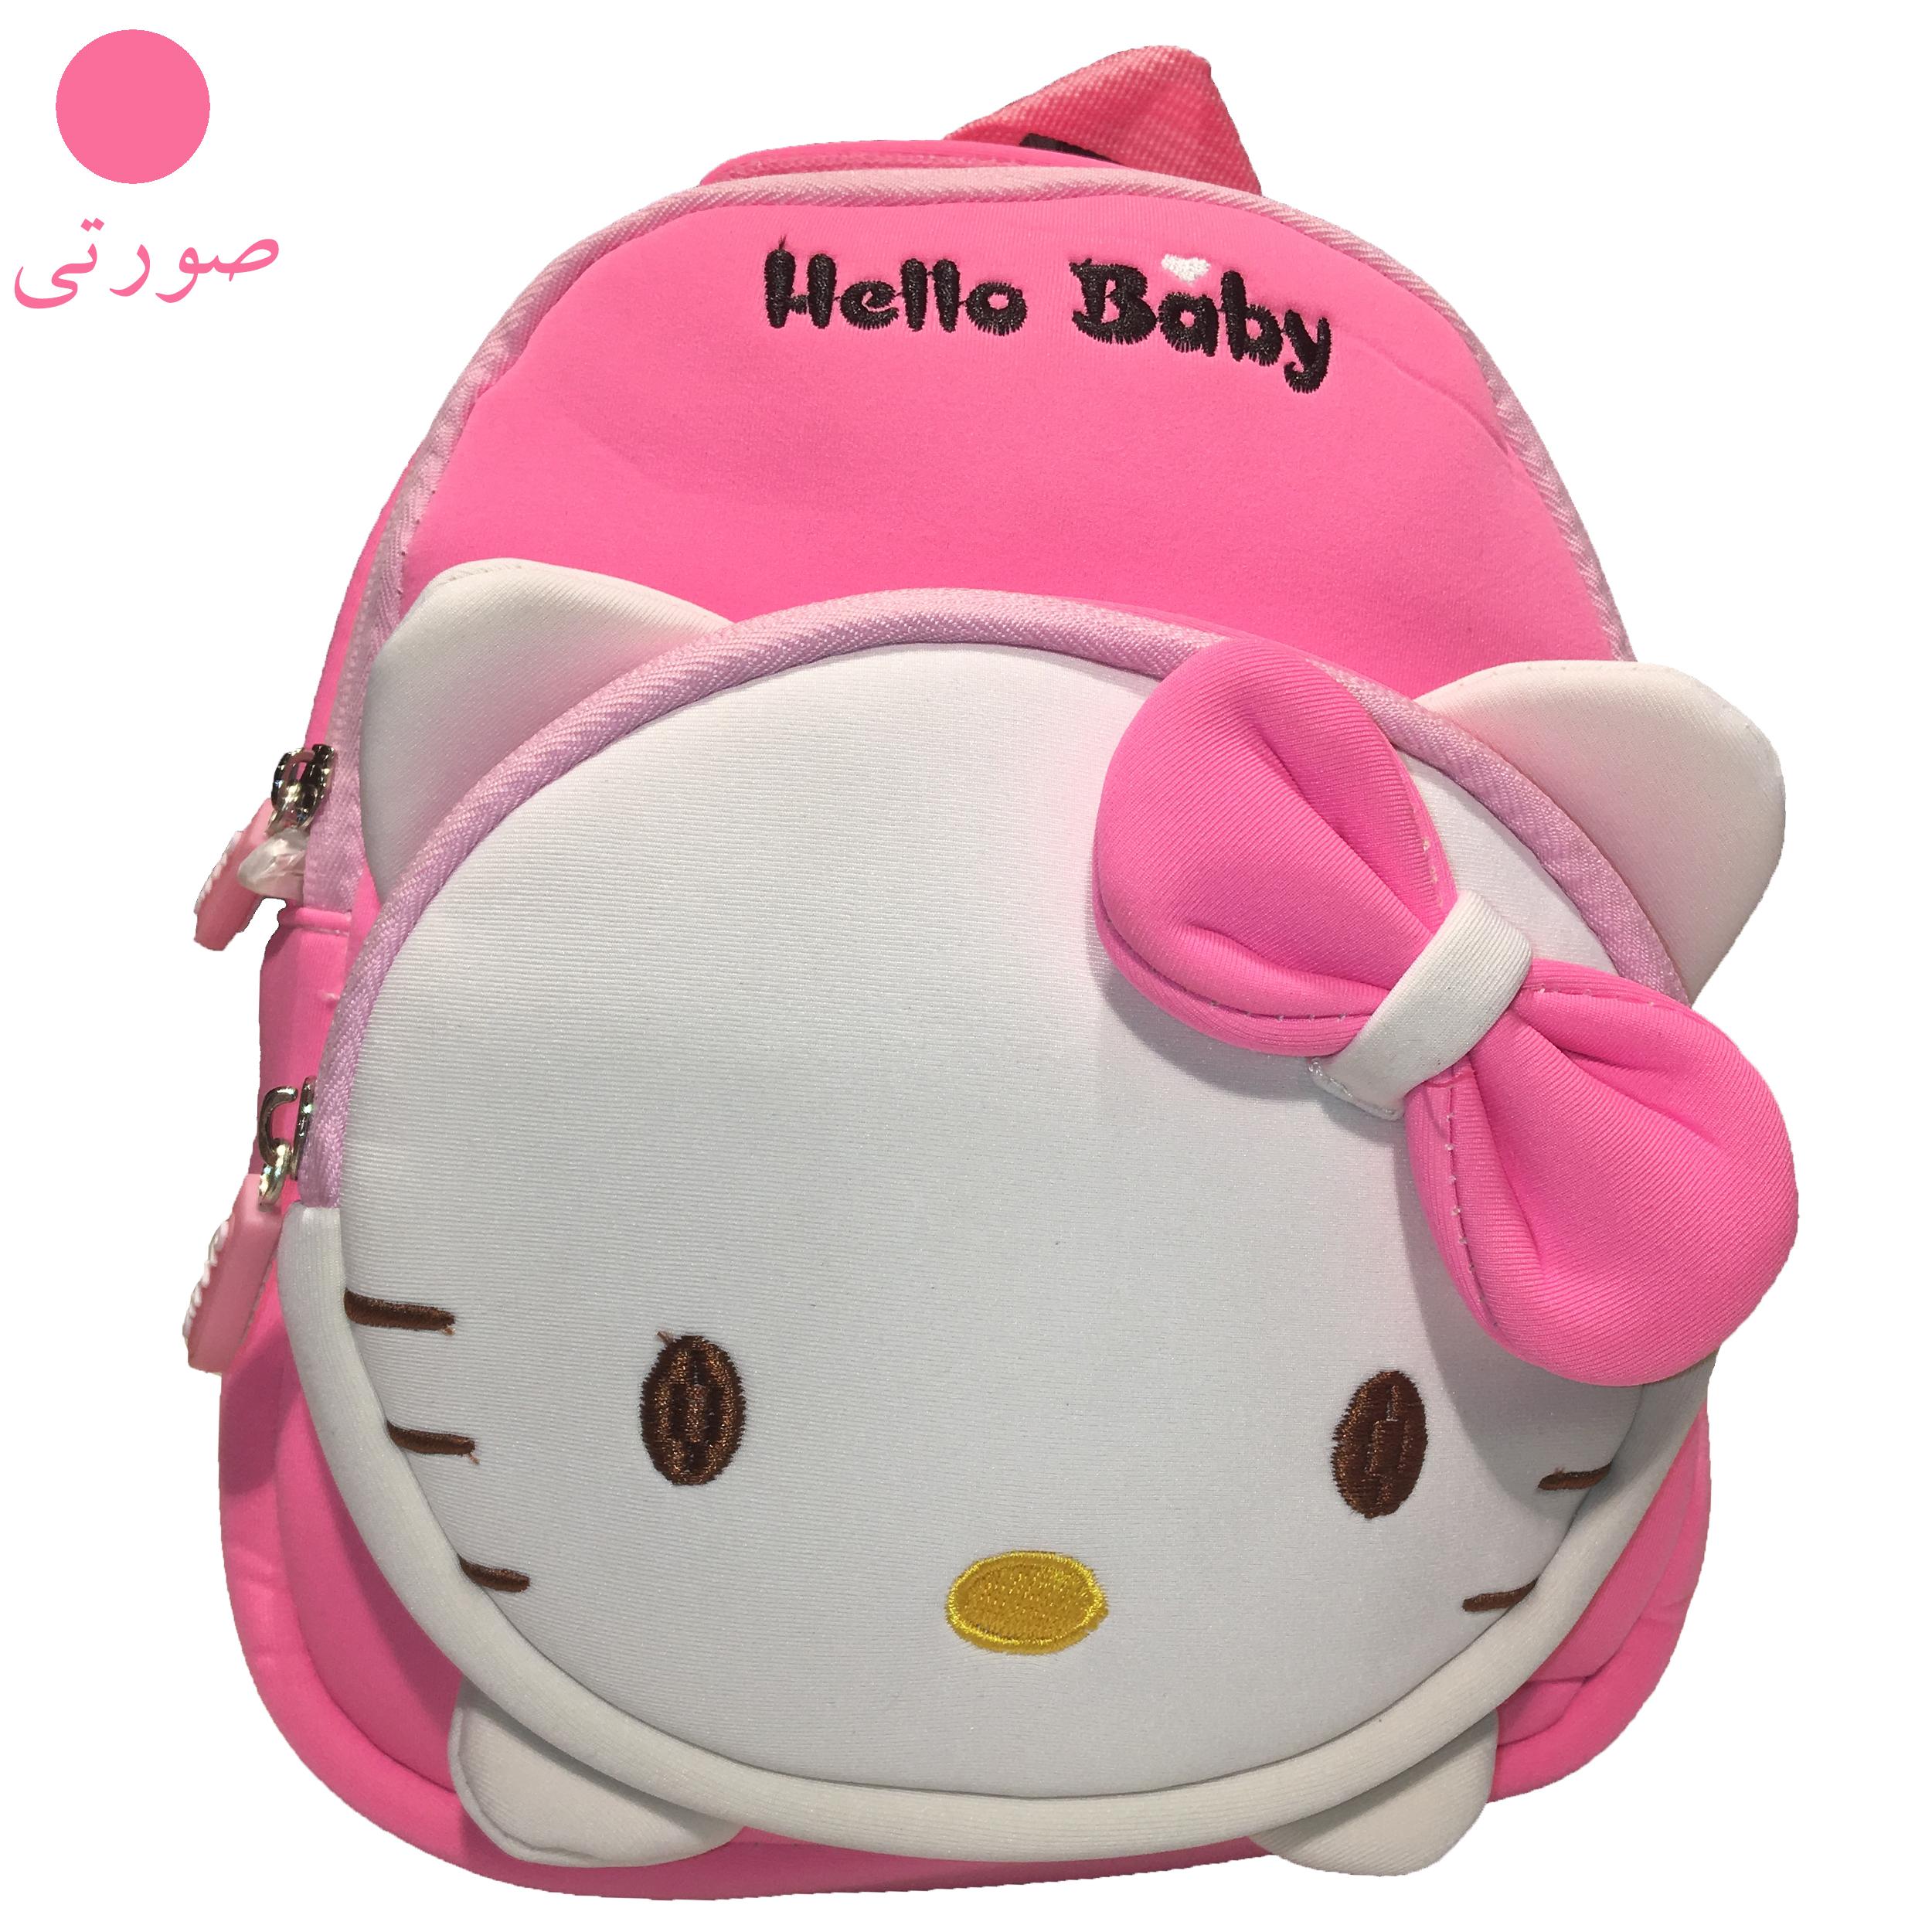 کوله پشتی دخترانه هلو بیبی کد adll3 -  - 6